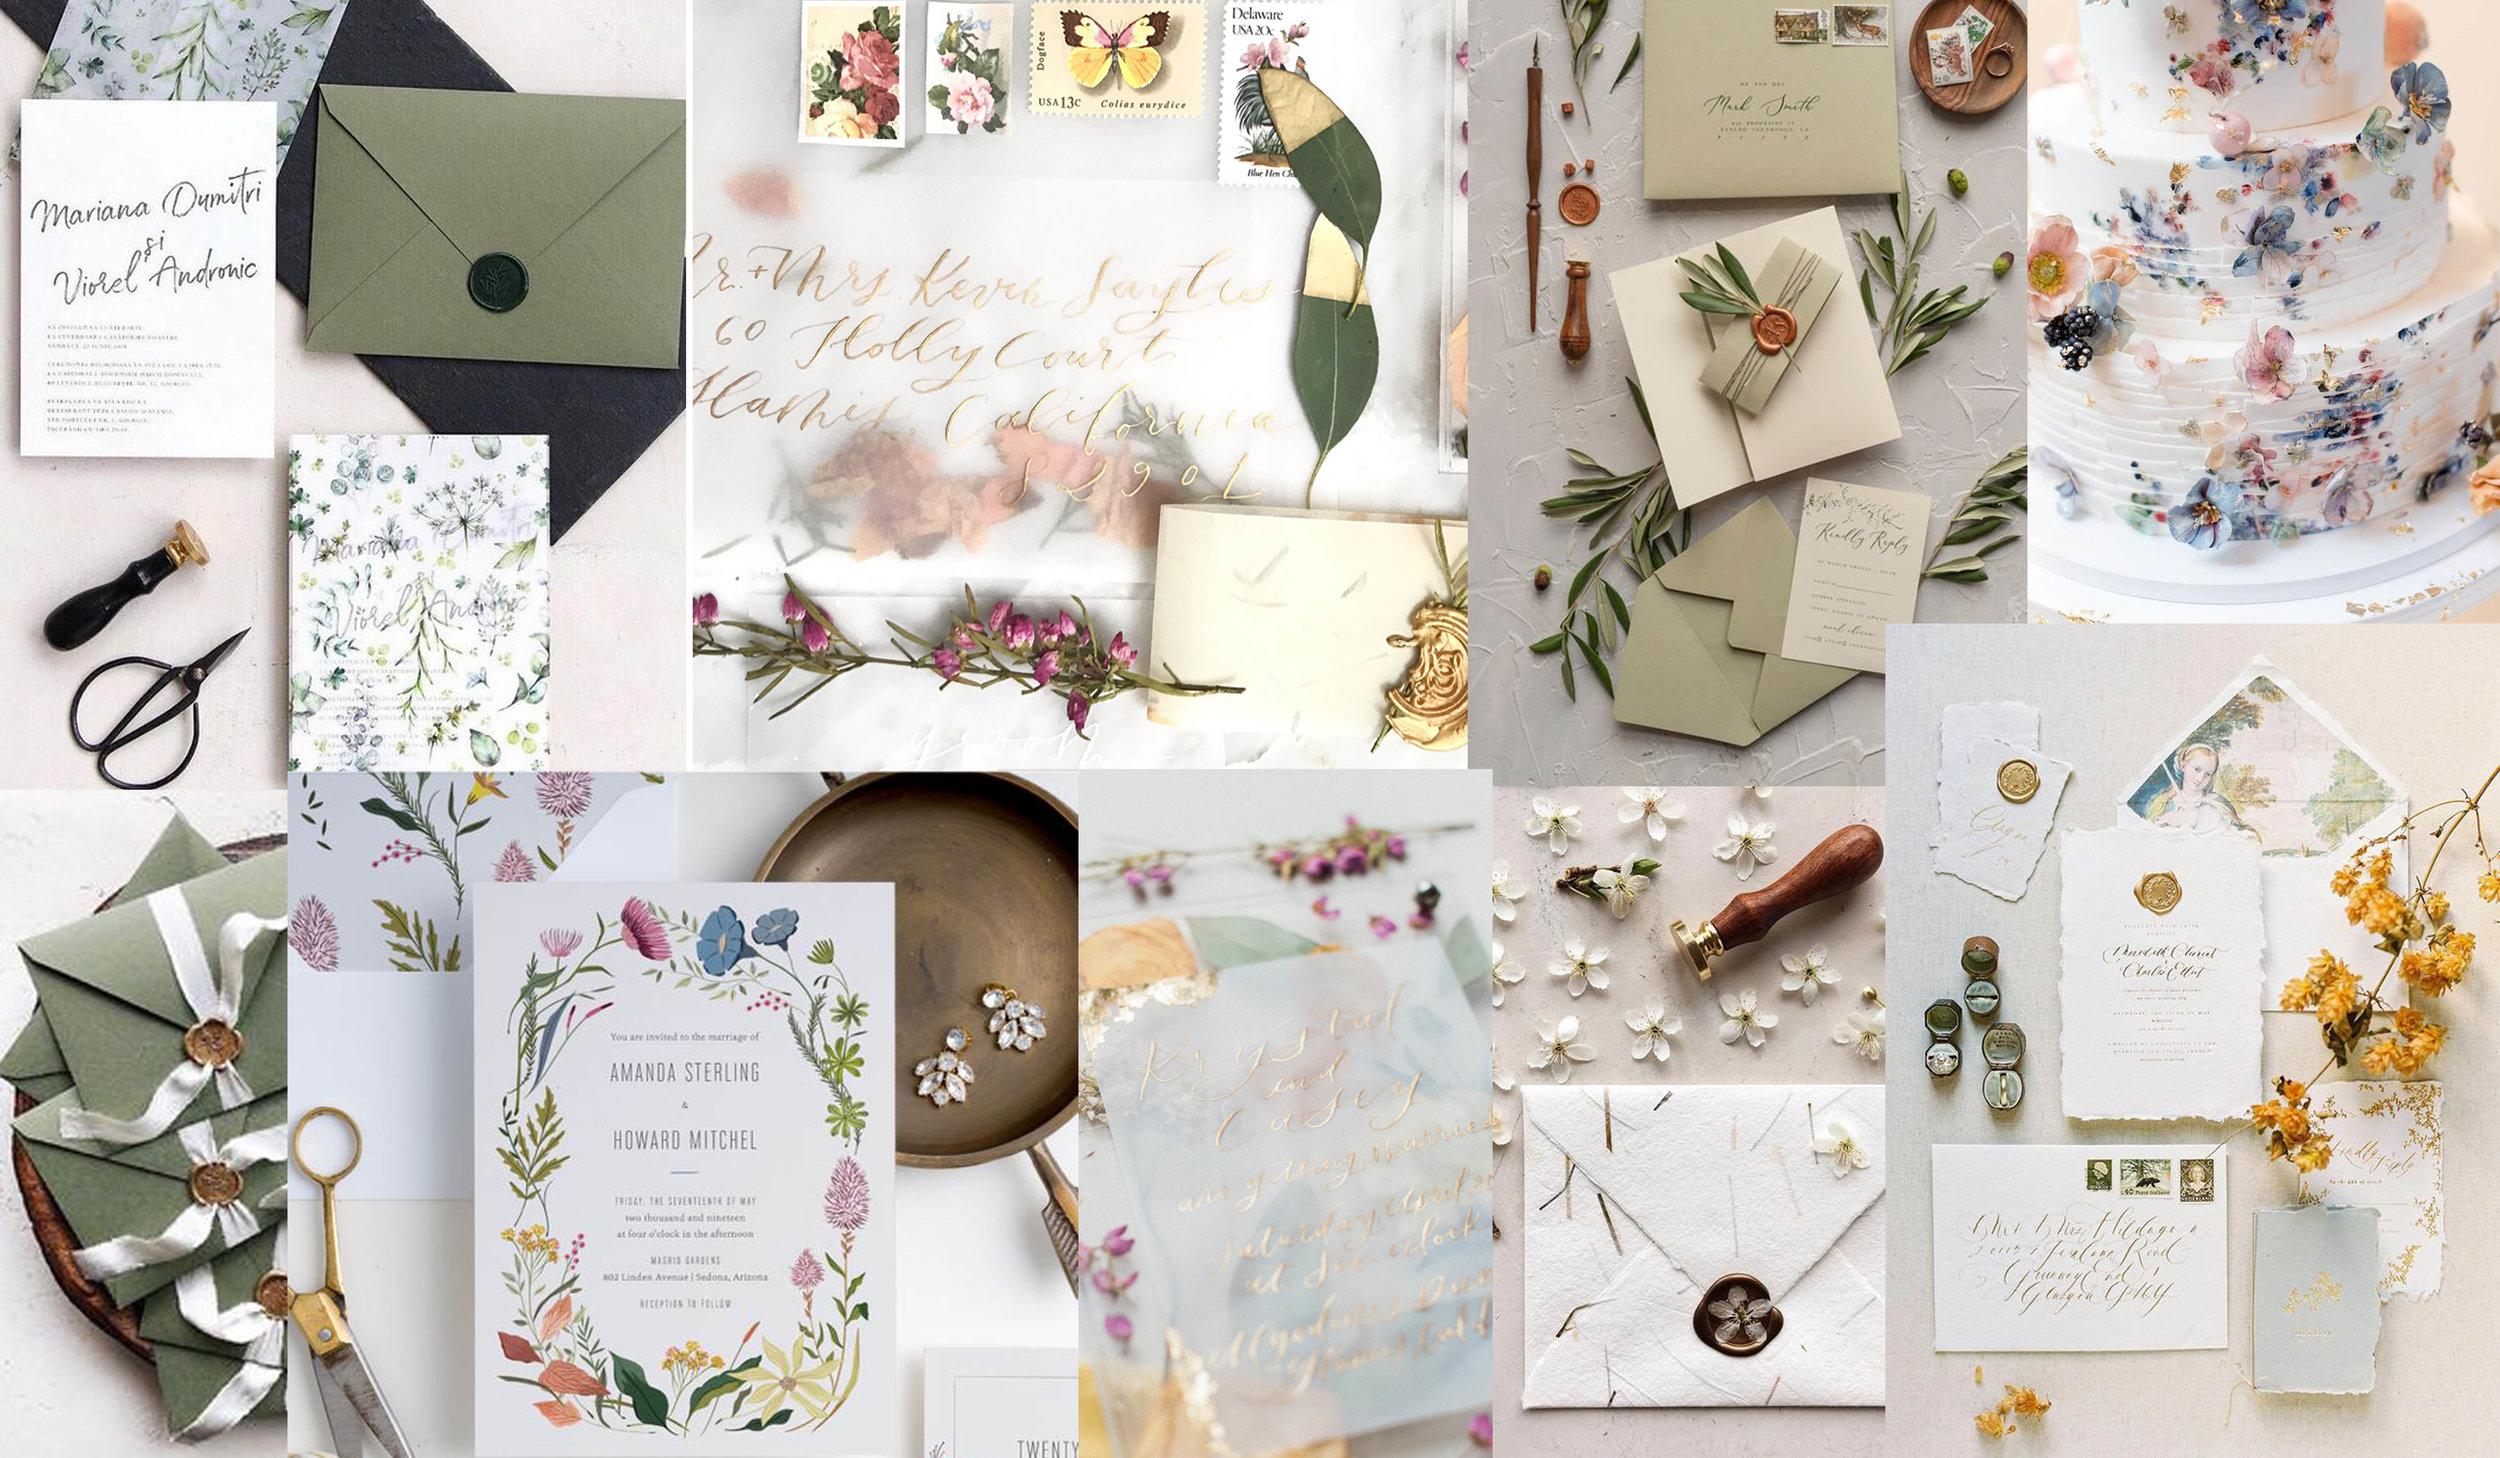 Margaery Tyrell Game of Thrones Highgarden Wedding Invitations